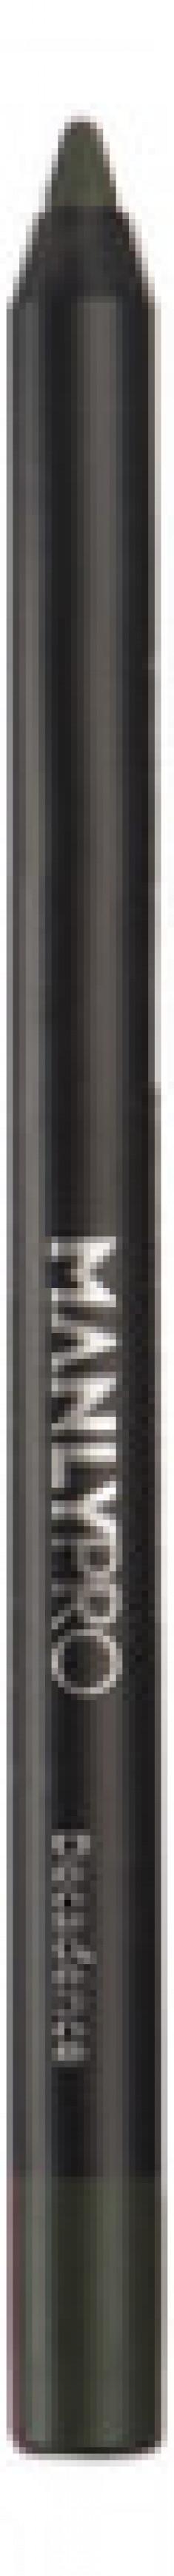 Карандаш для глаз Manly PRO E107 Декаданс \ Decadence 6,1г